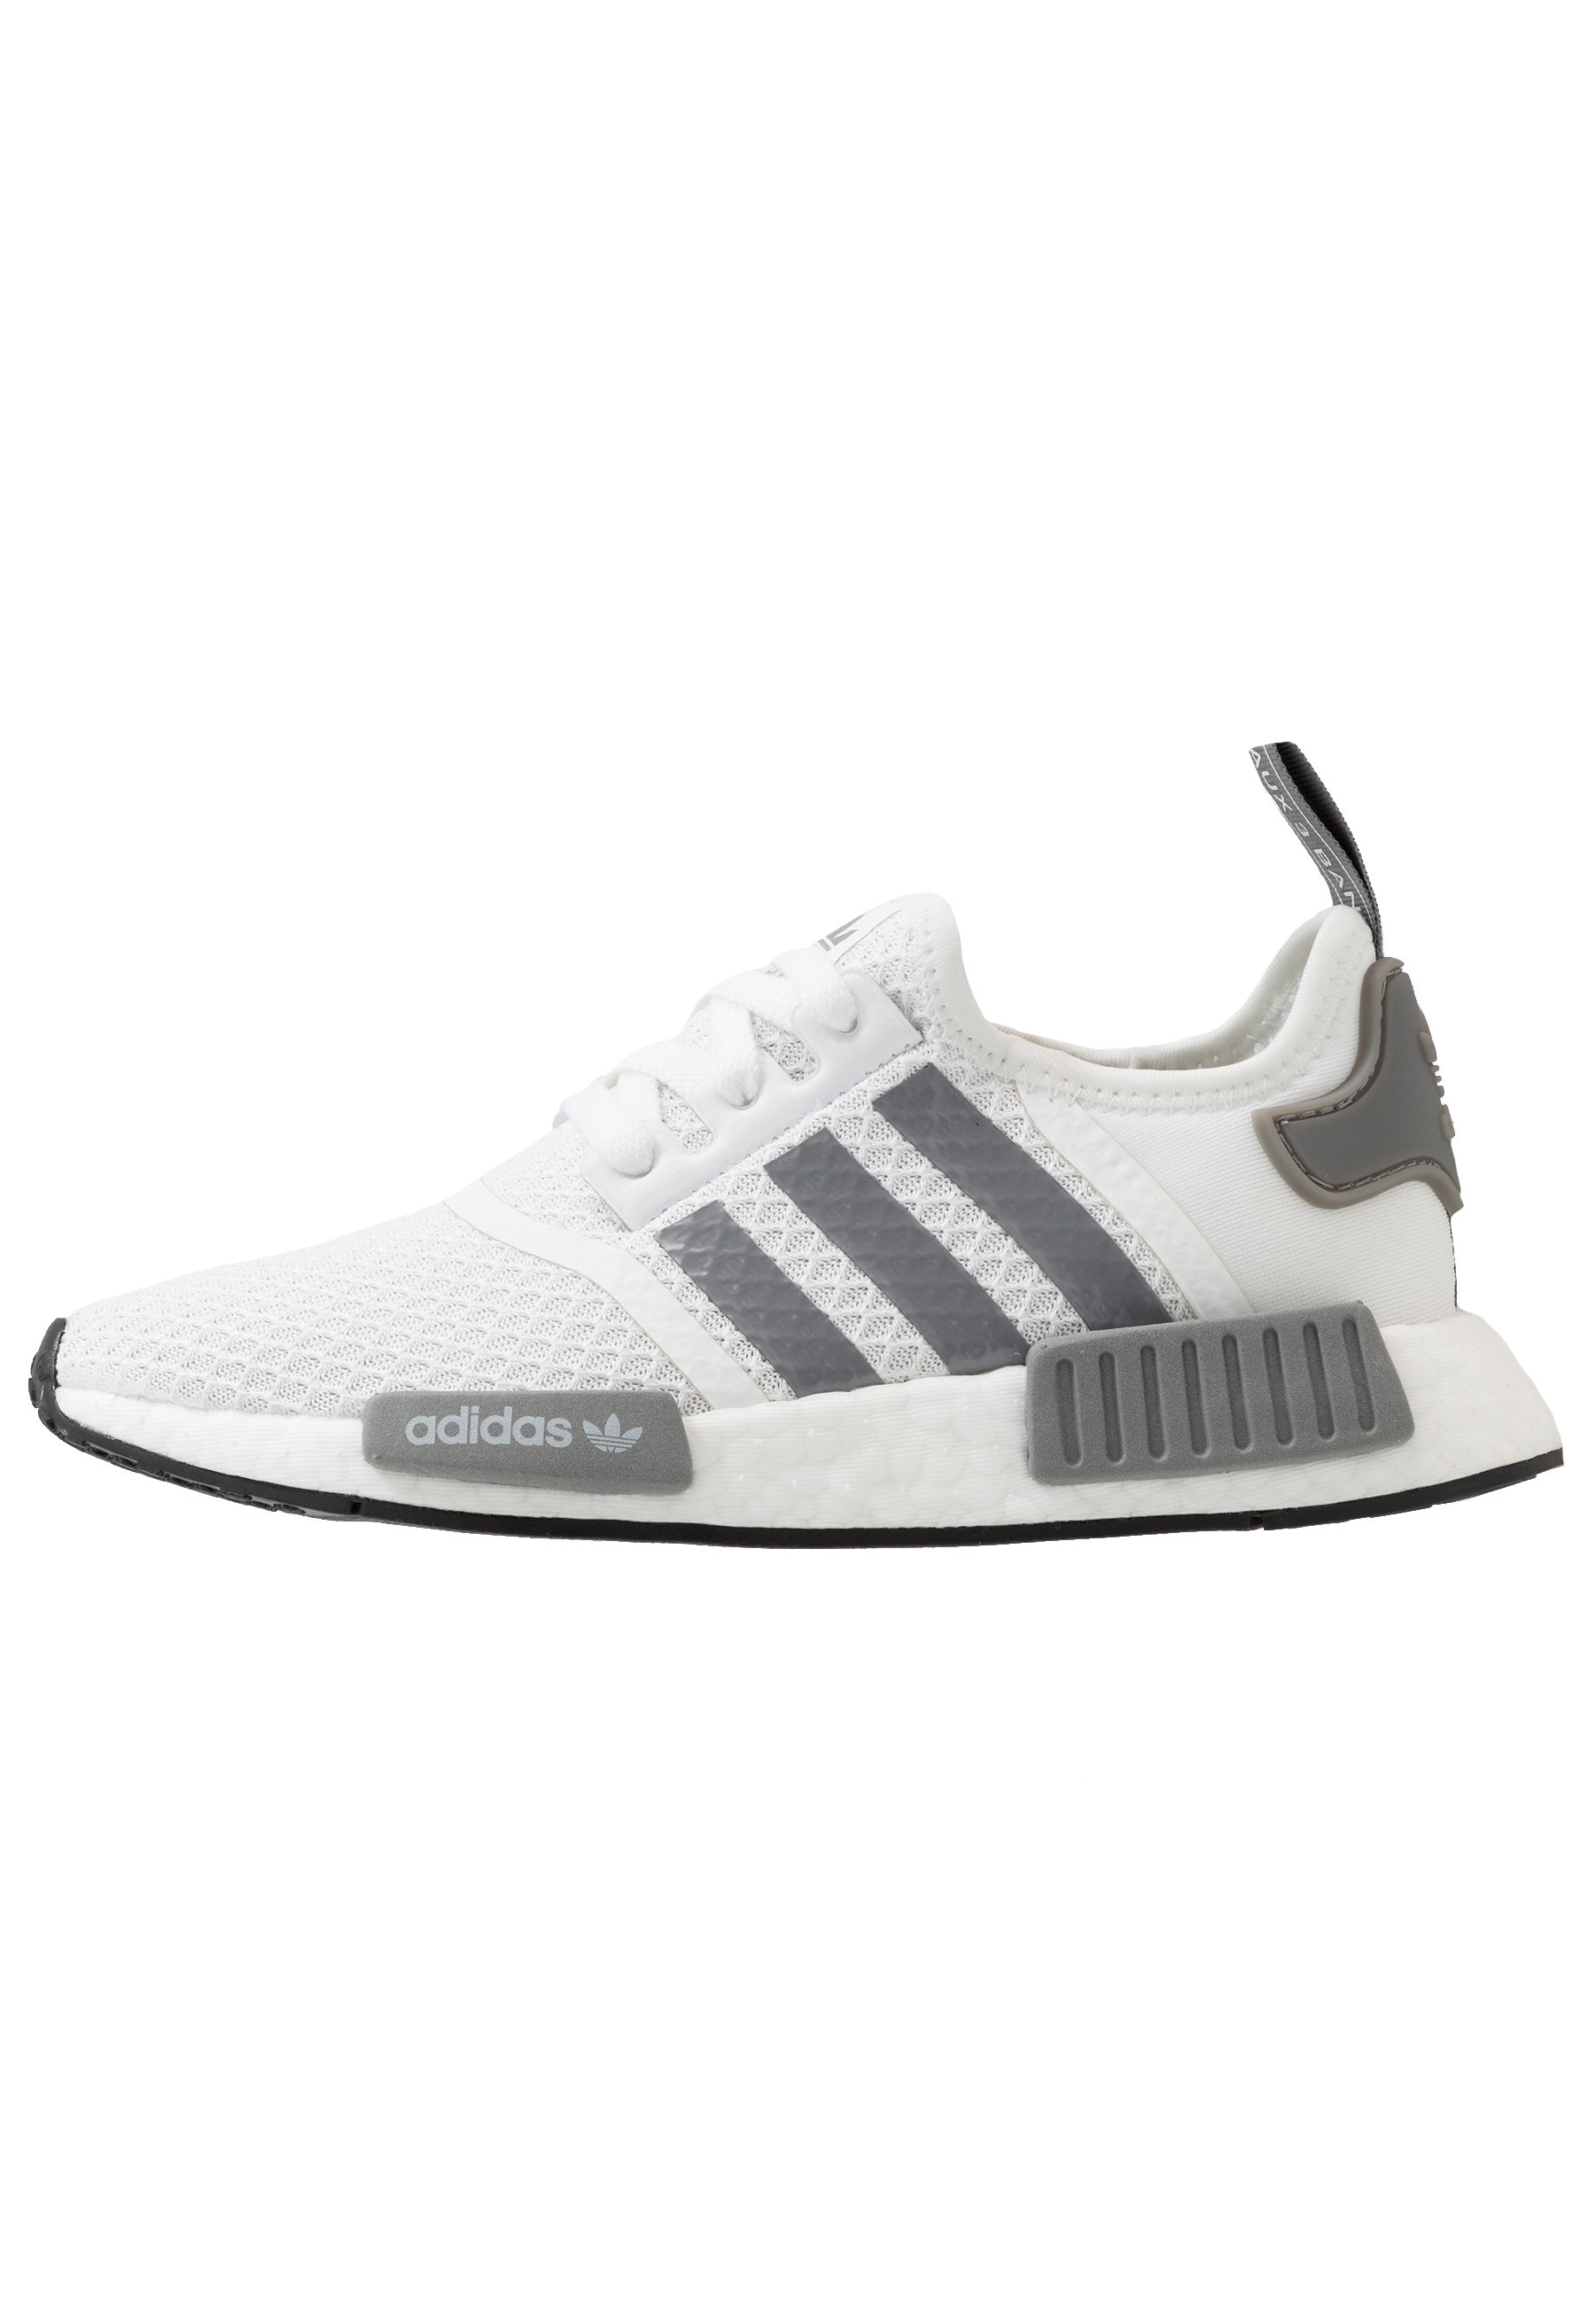 adidas Originals NMD_R1 SHOES Sneaker low grey